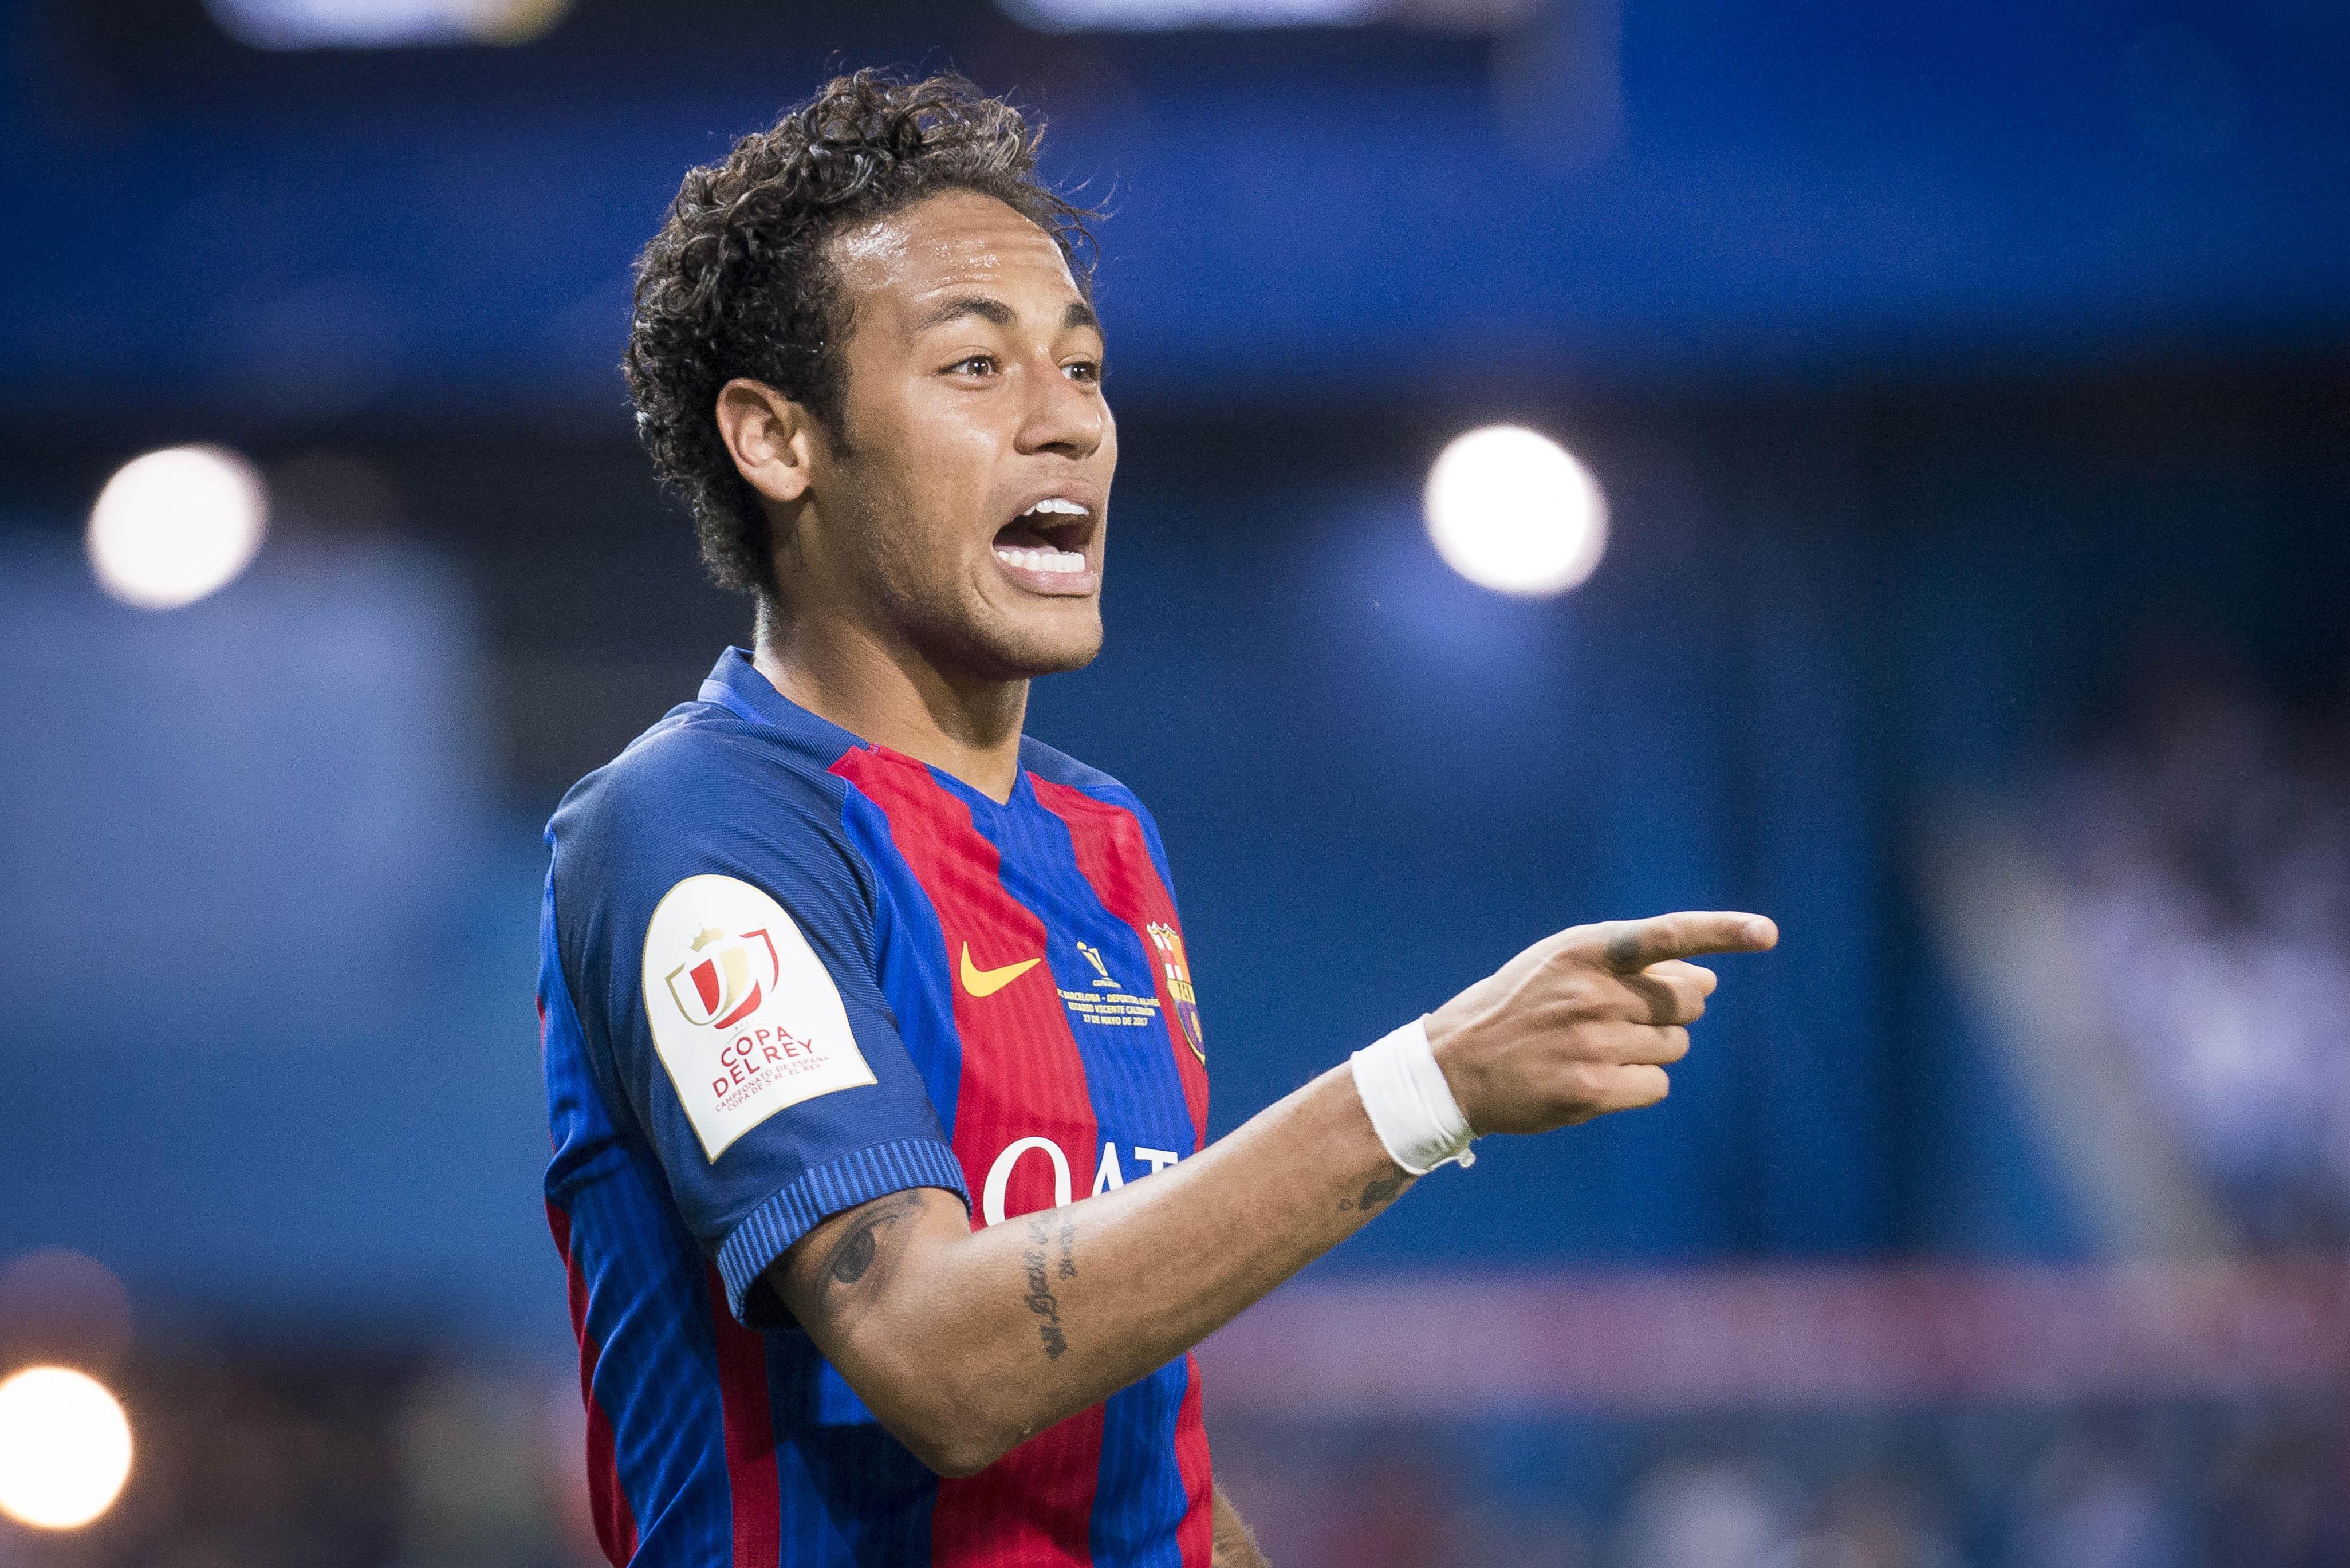 Football - Transferts - Neymar au PSG: comprendre le dossier en 4 minutes